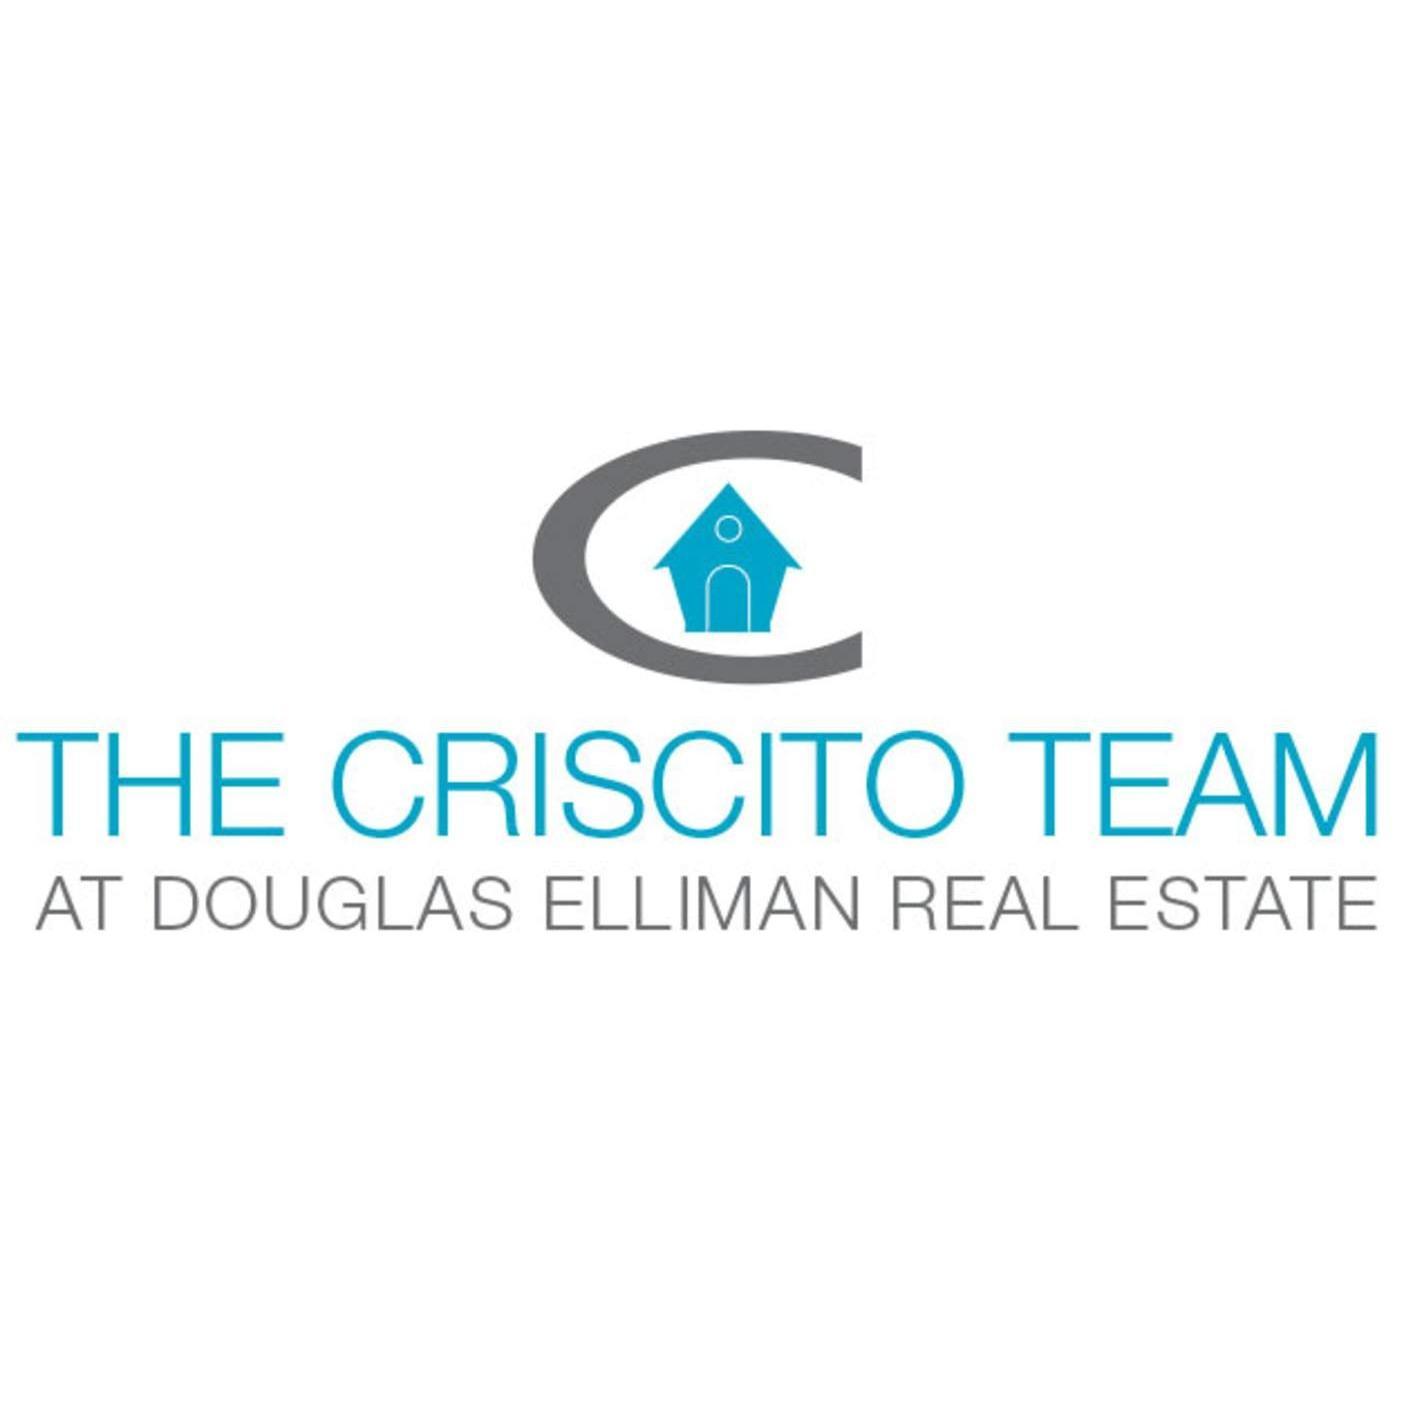 The Criscito Team at Douglas Elliman Real Estate